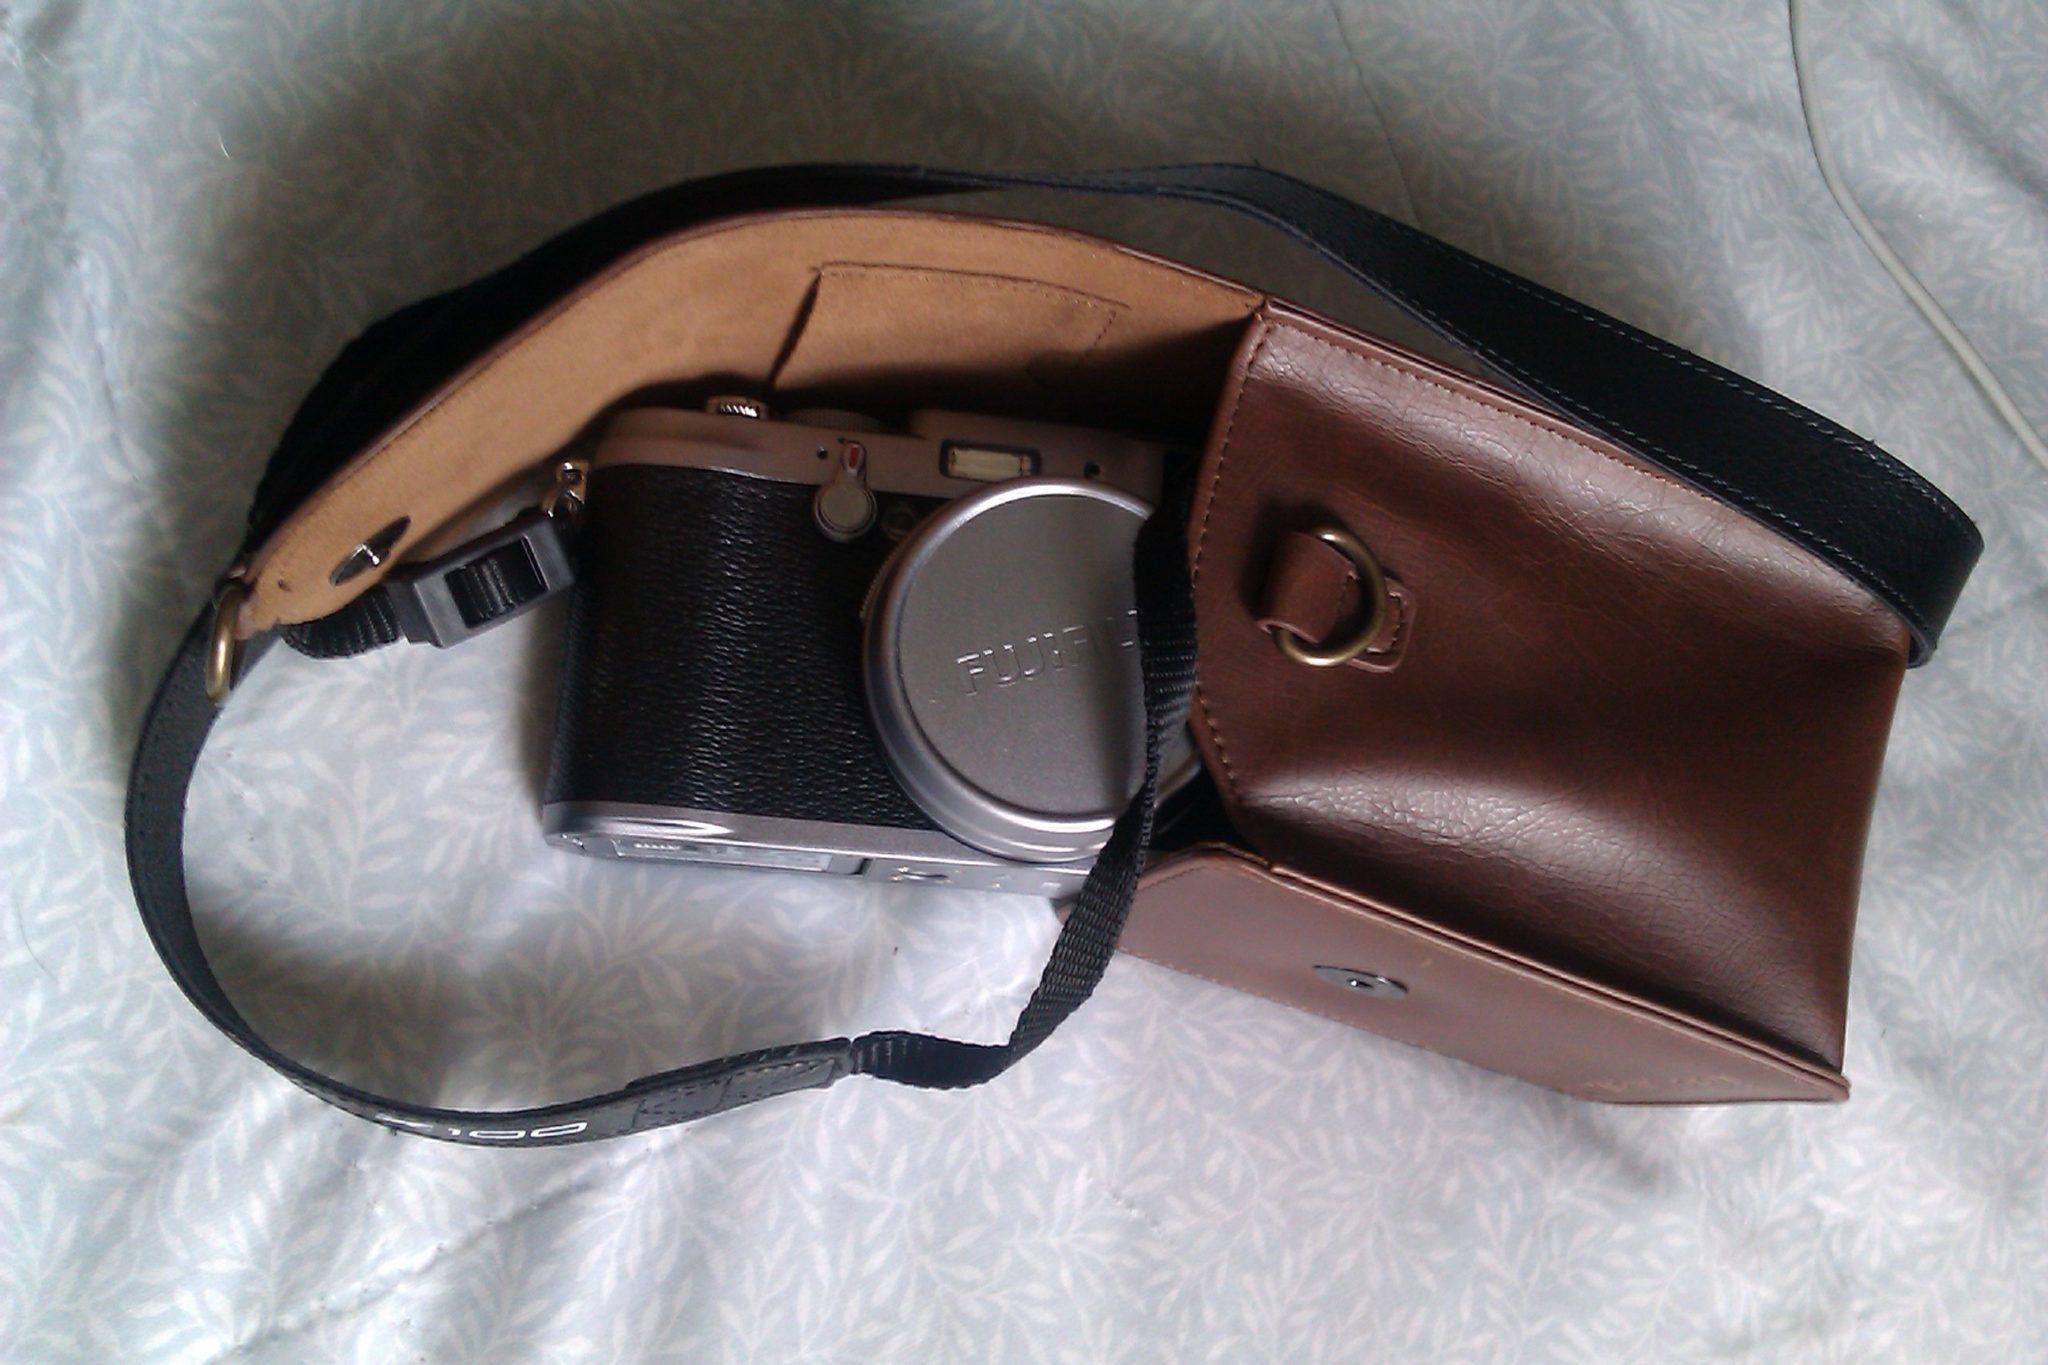 Fuji x100 leather case